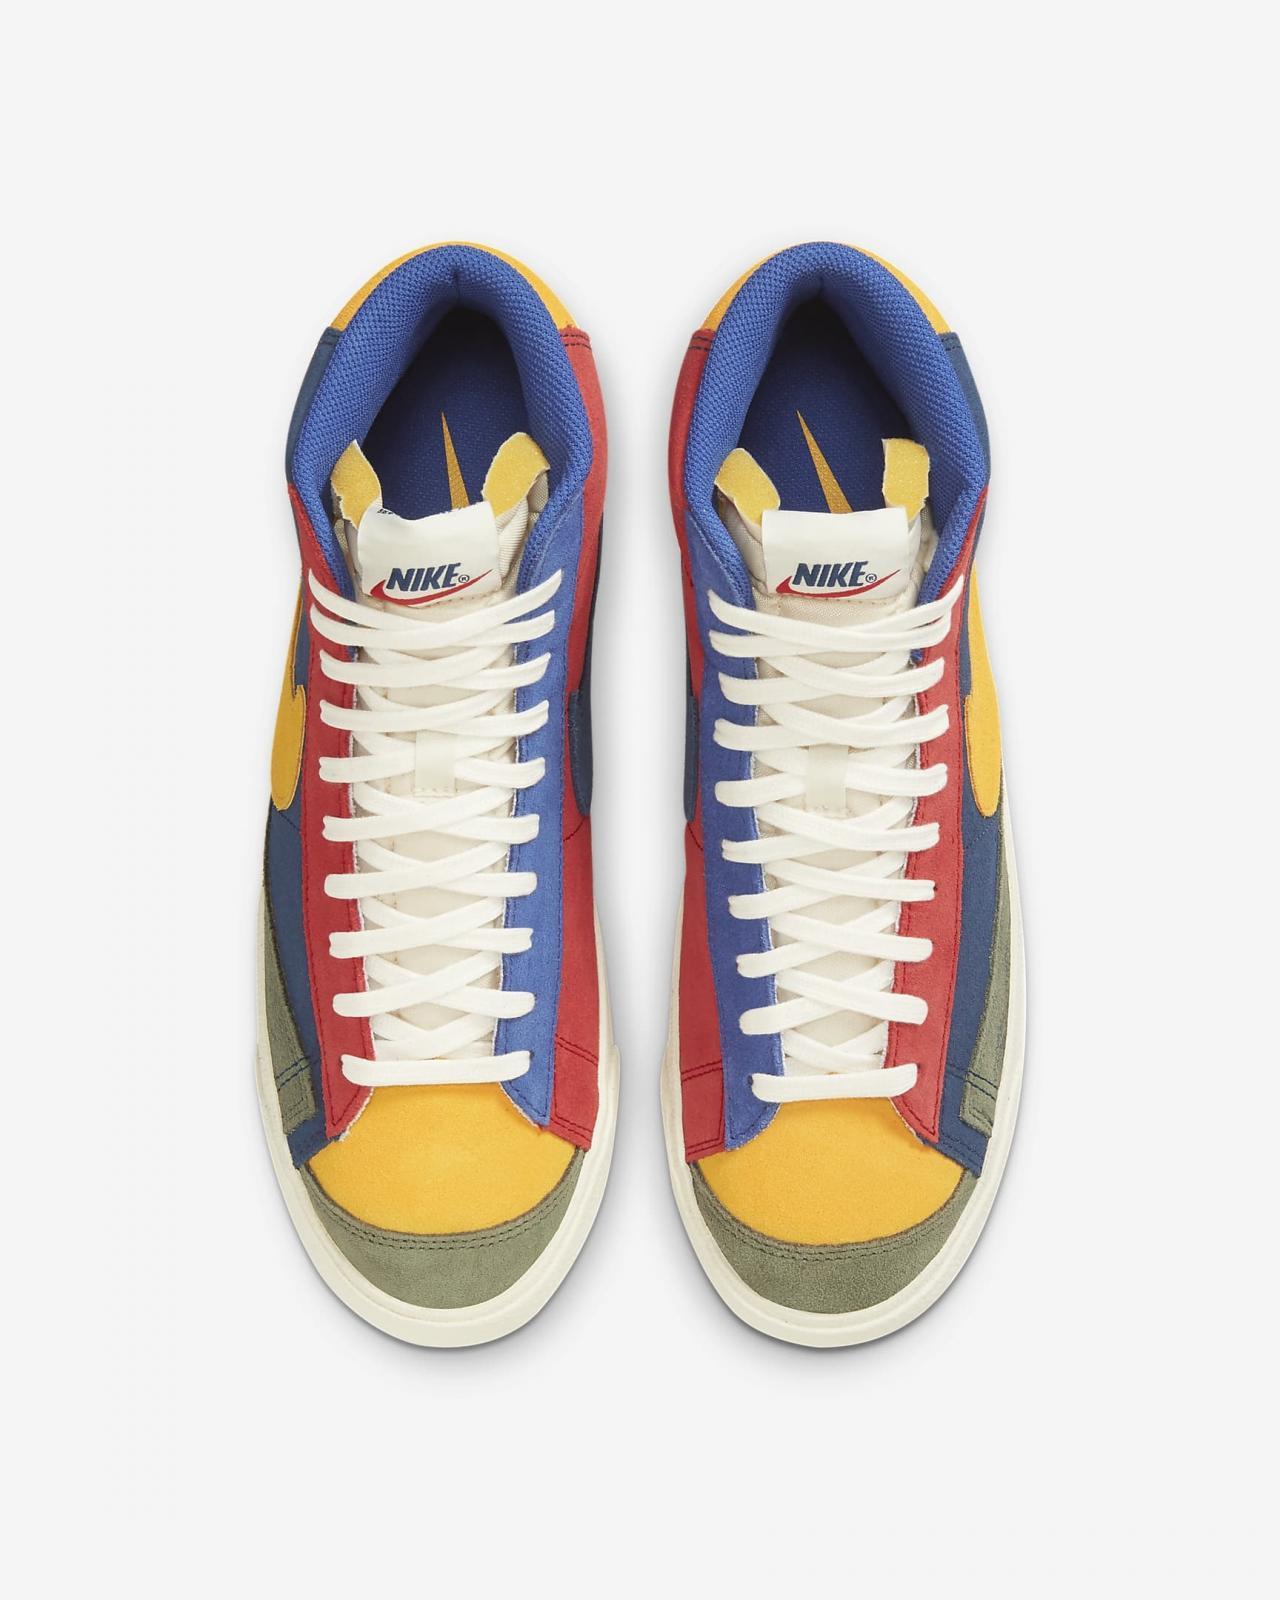 Nike Sportswear推出全新海岸蓝/大学红/日晕黄色Blazer Mid '77 VNTG WE Suede